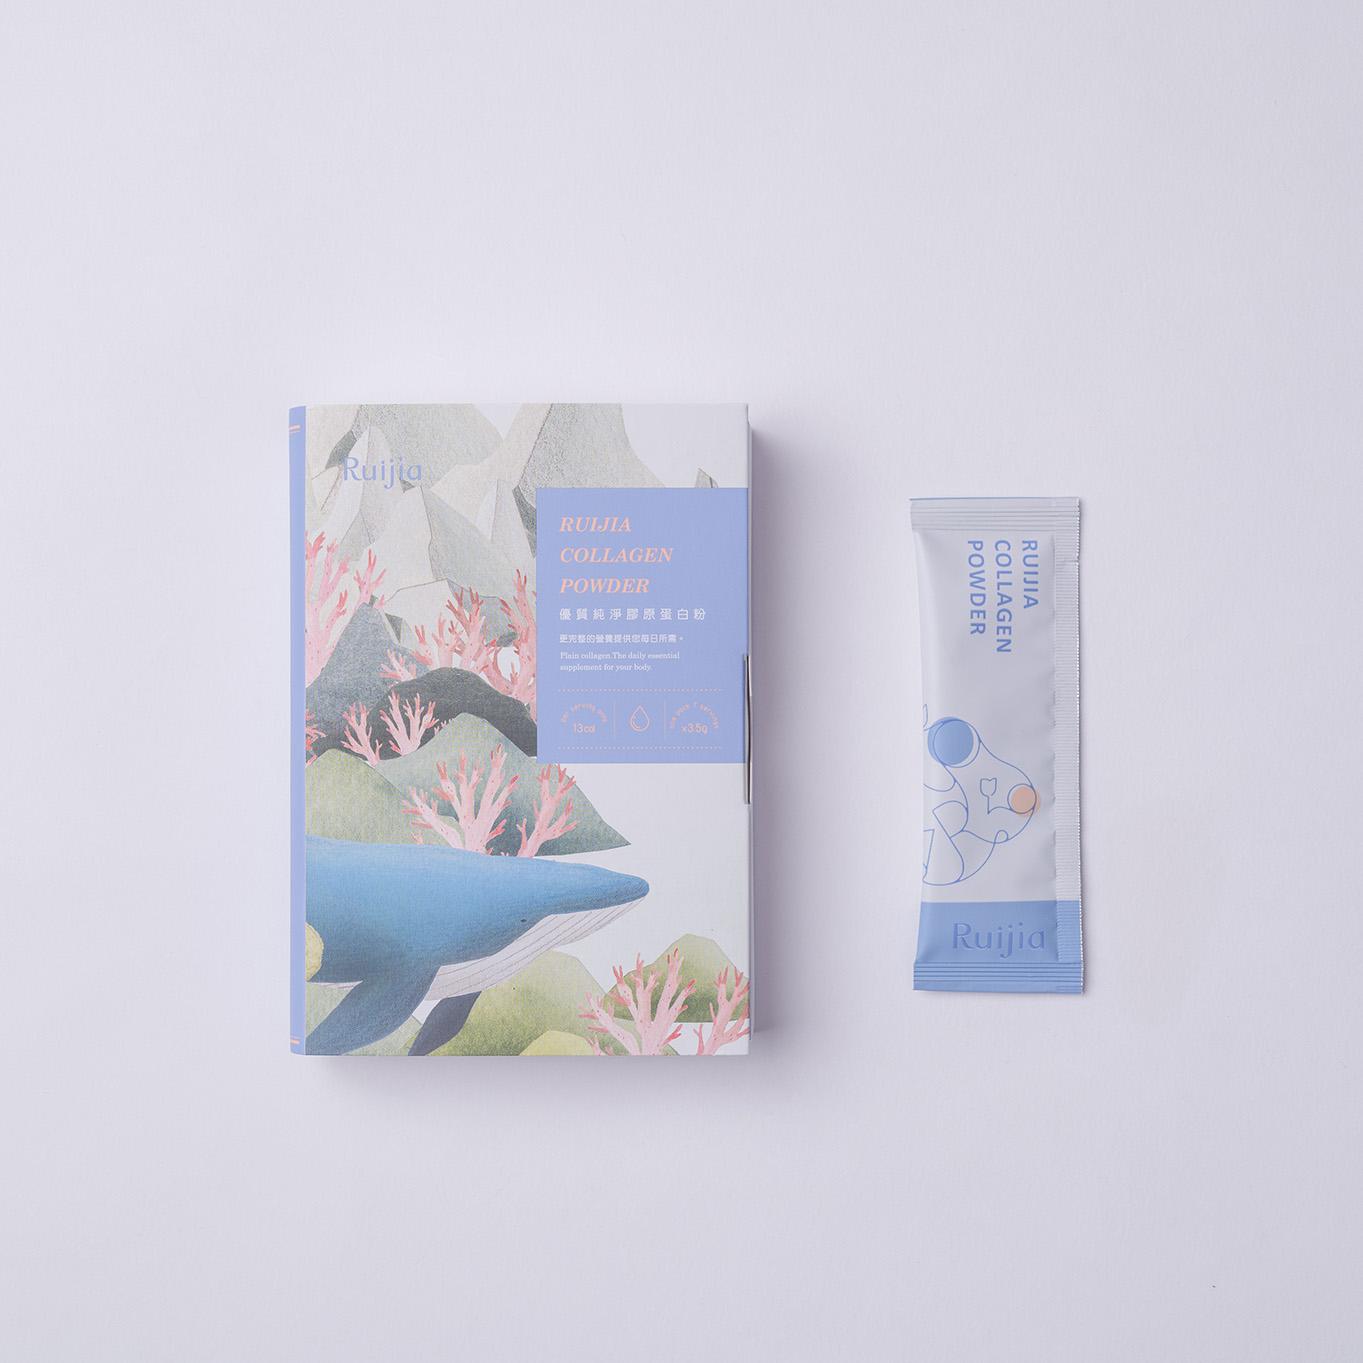 優質純淨膠原蛋白粉(7日份) Ruijia Collagen Powder